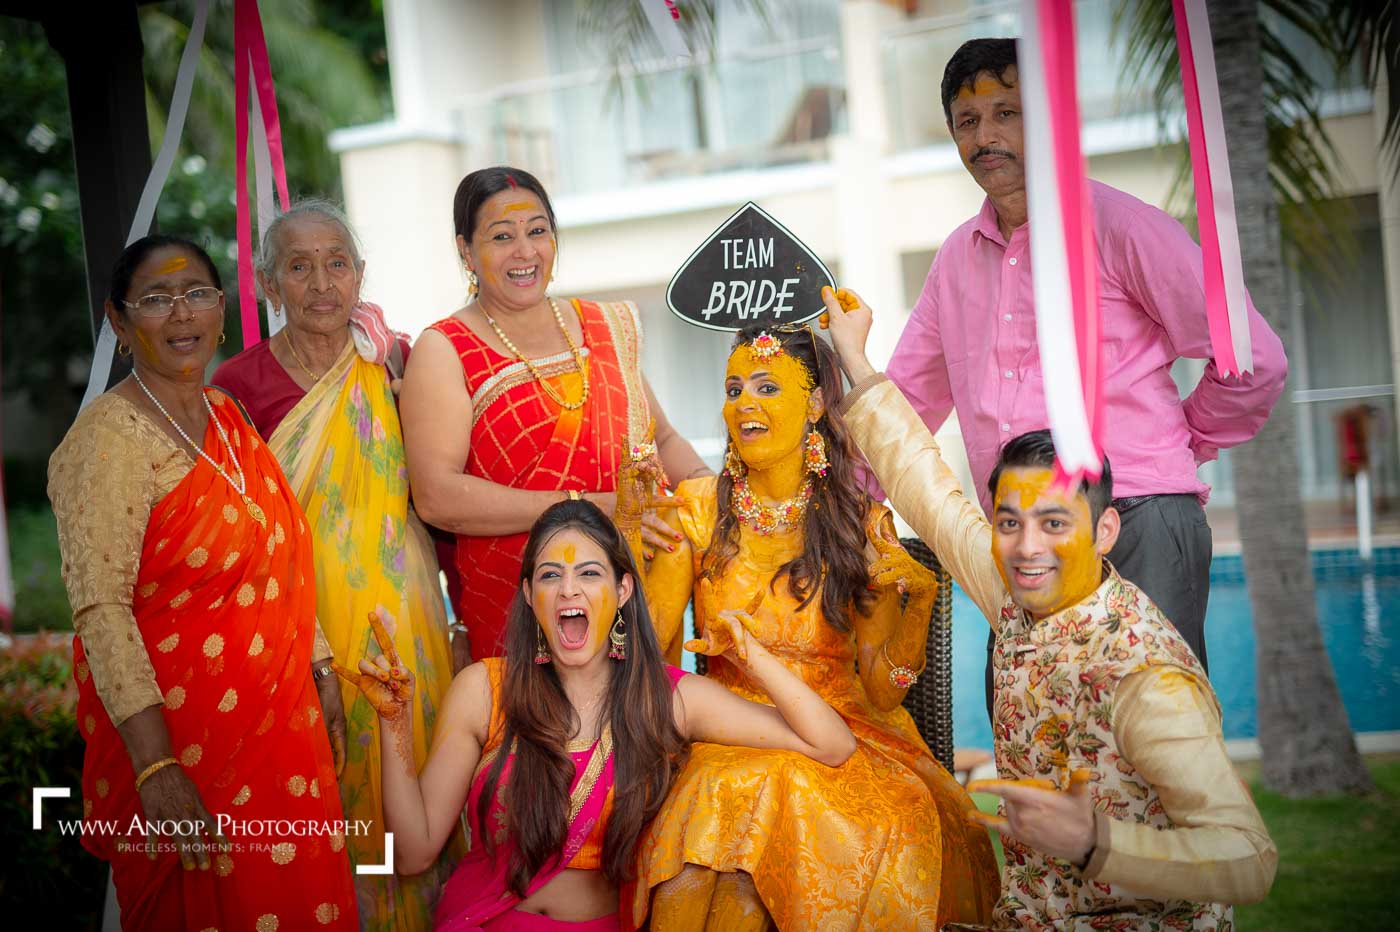 Destination-Nepali-Wedding-in-thailand-sheraton-hua-hin-008